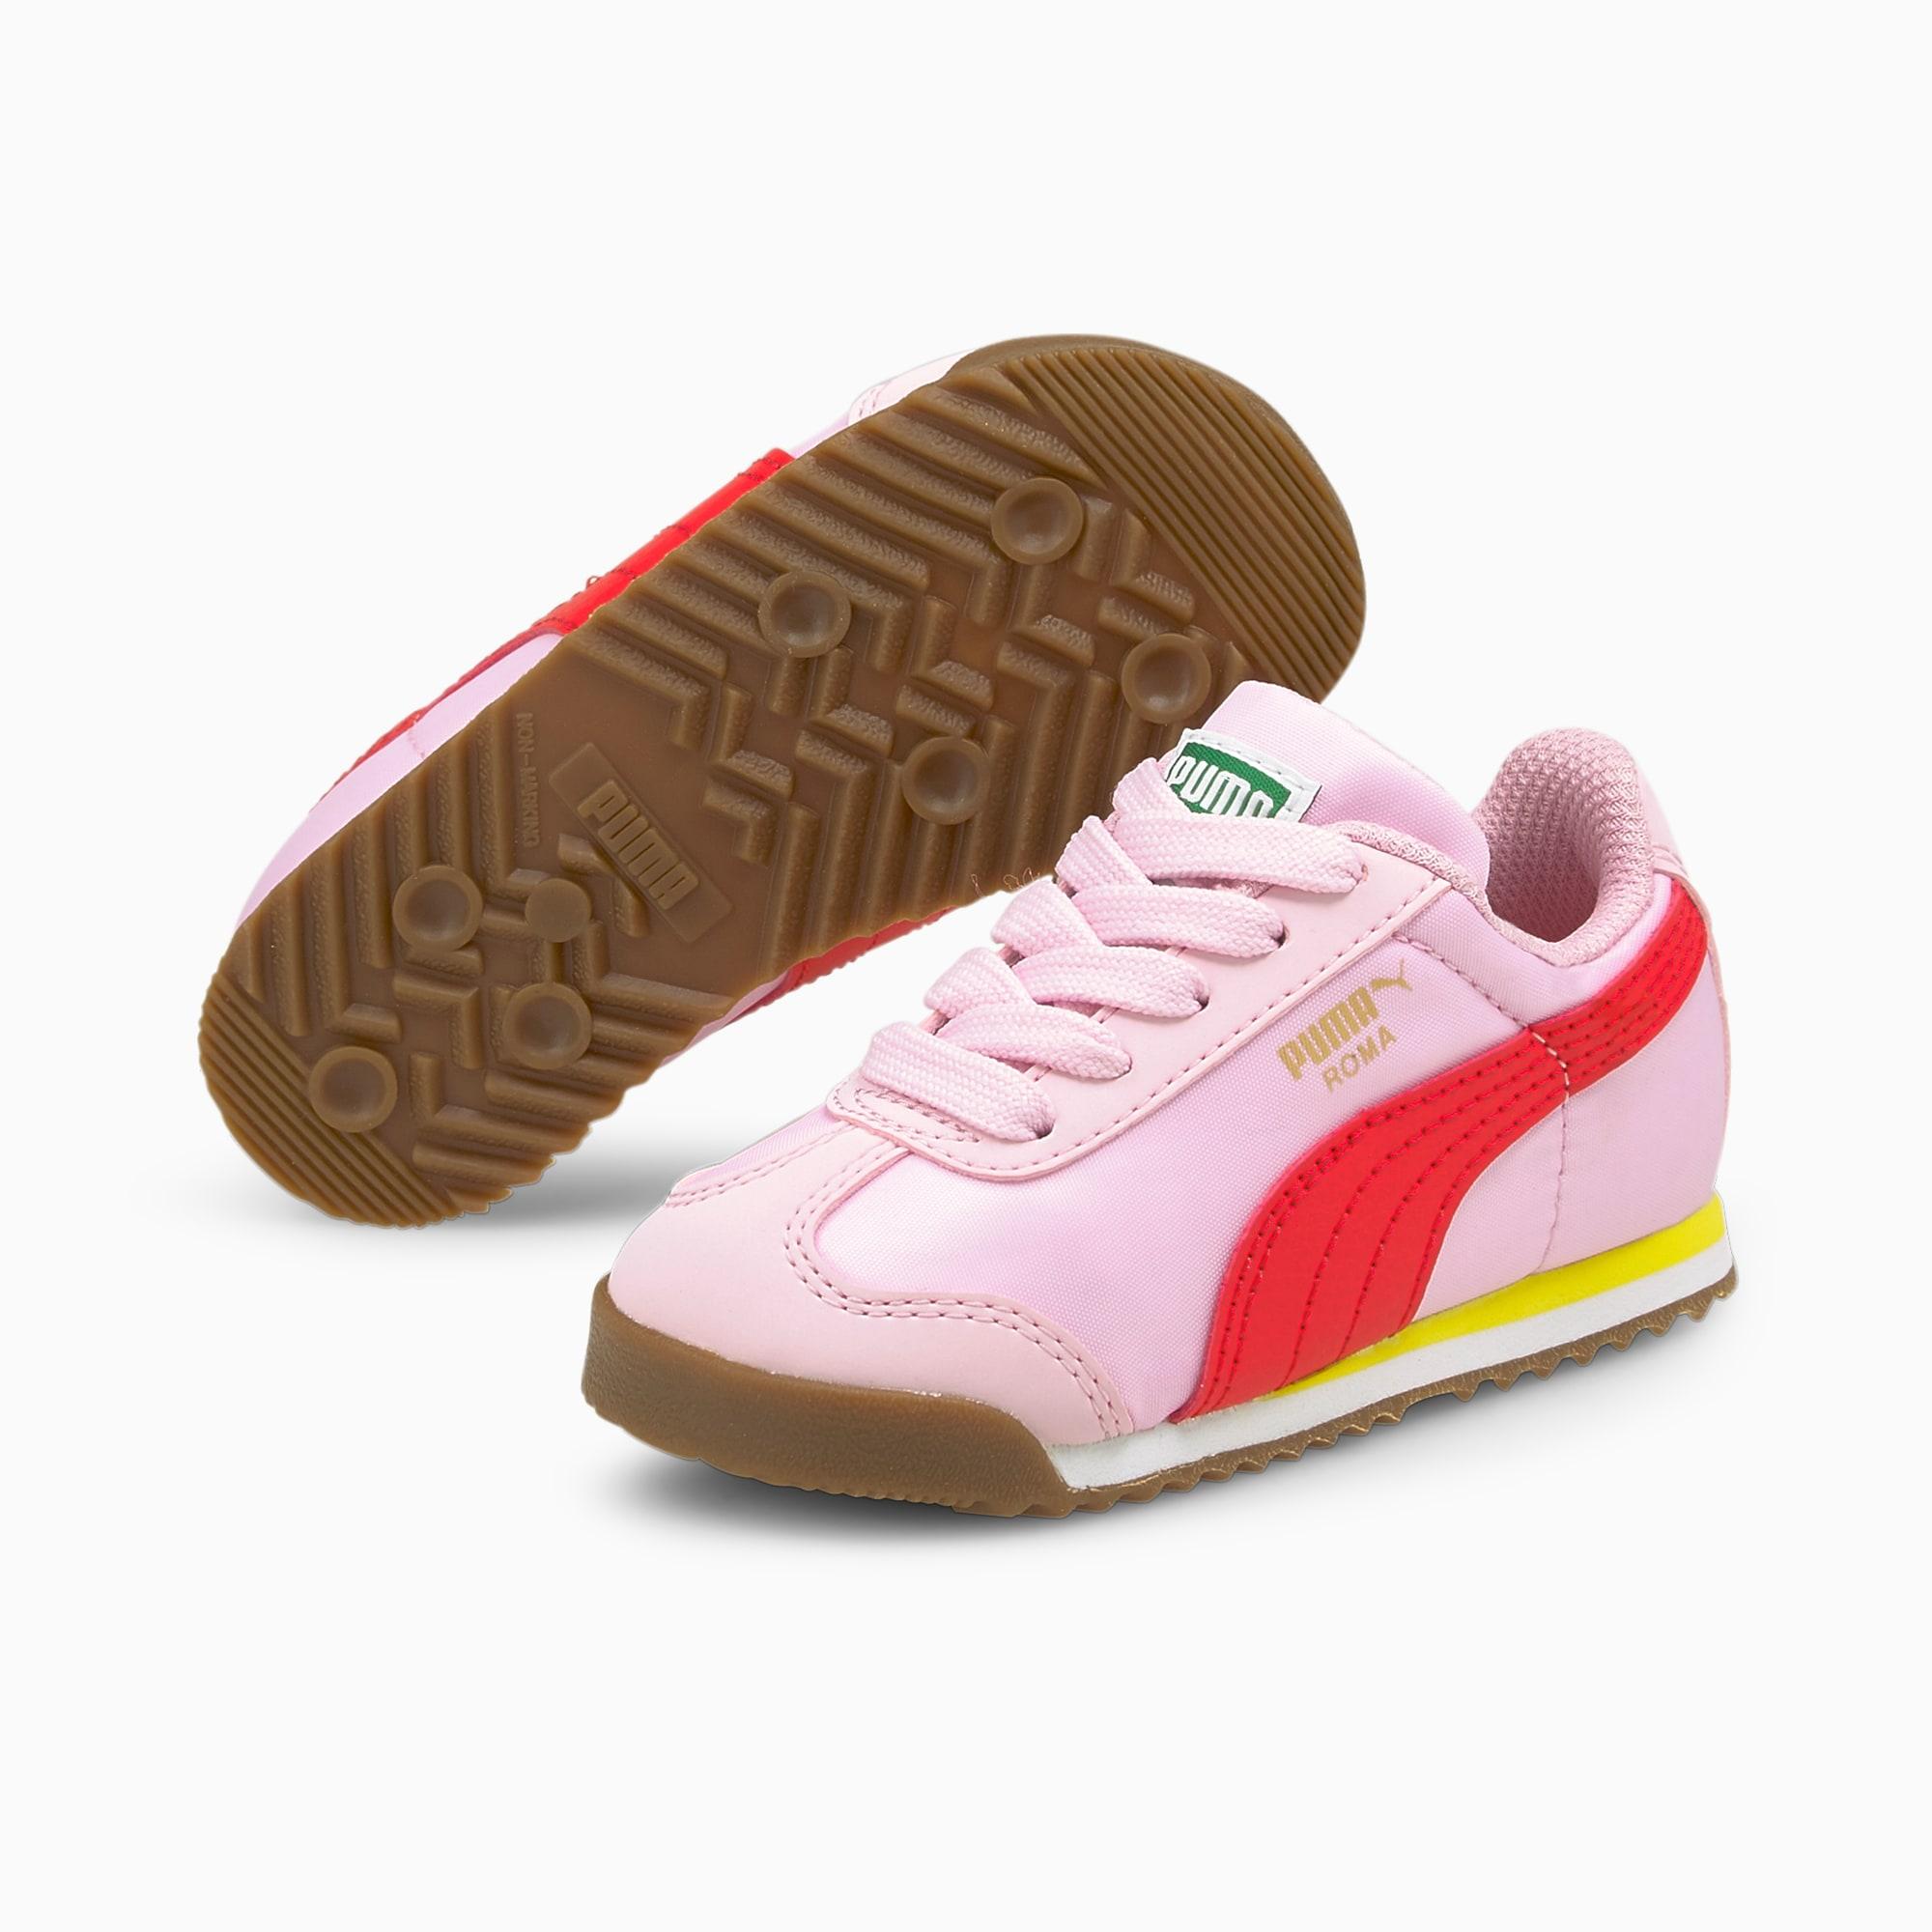 Roma Basic Summer Toddler Shoes